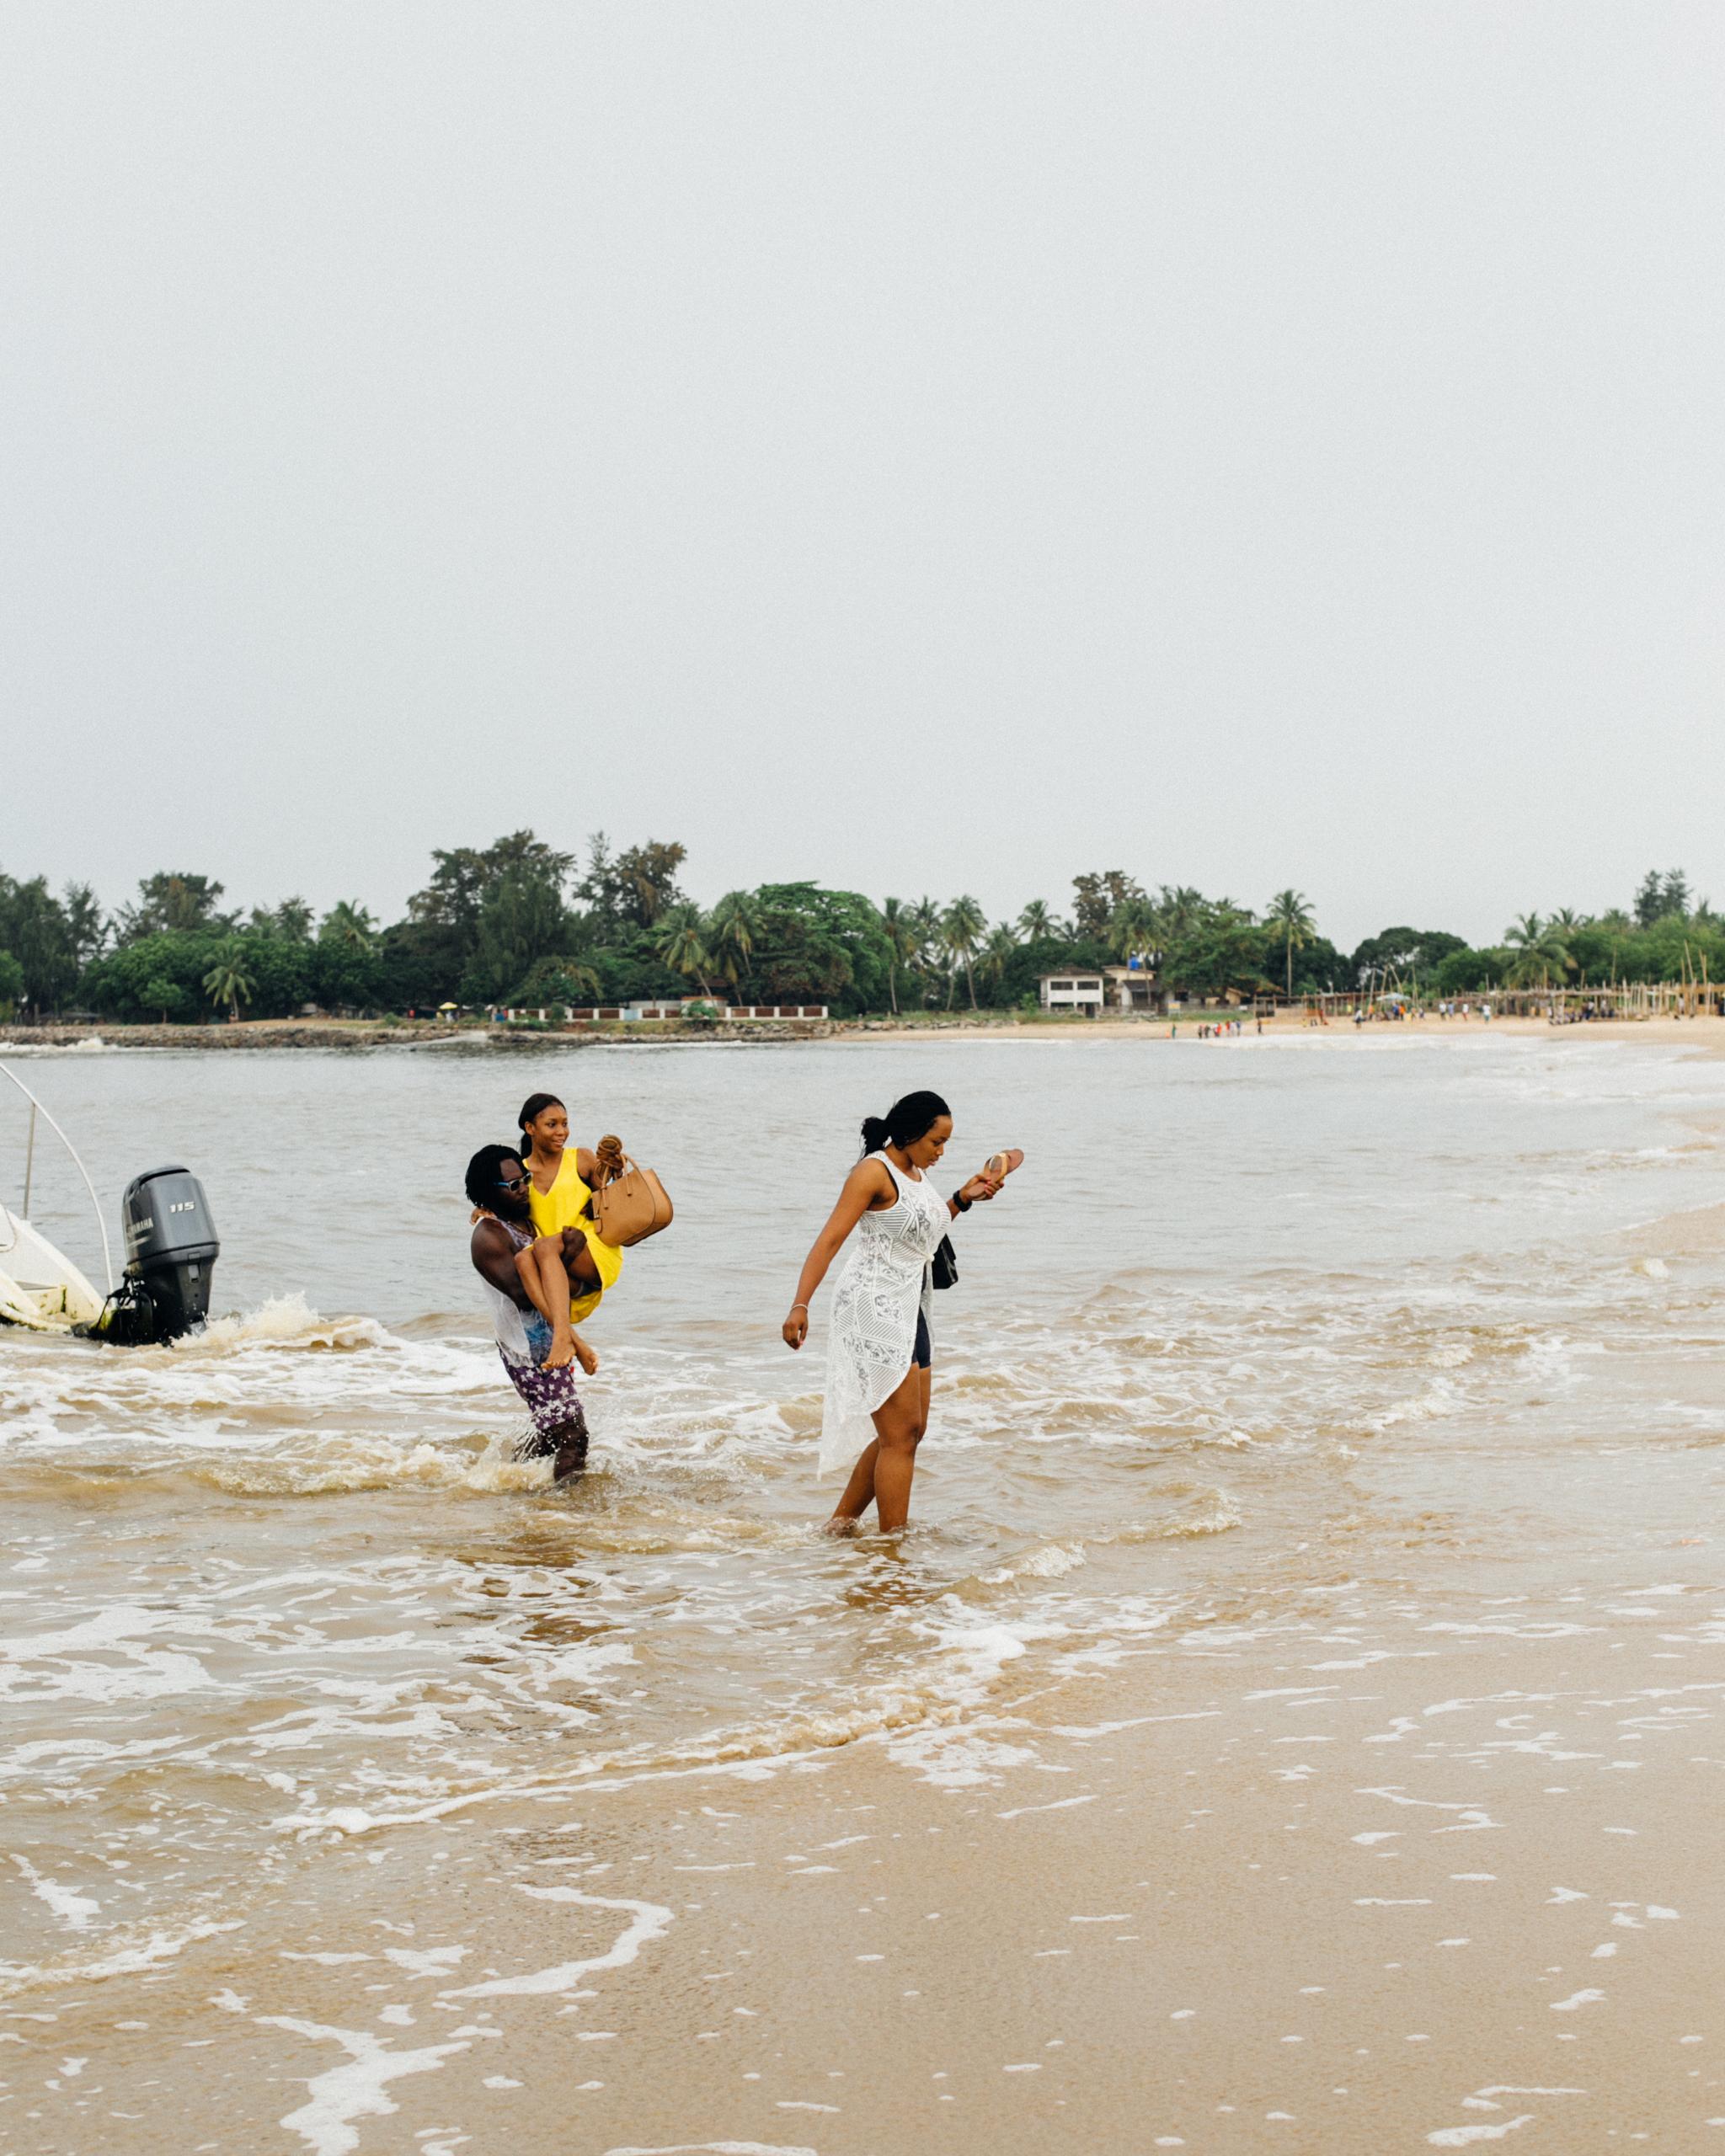 Lady wading in the water, Tarkwa Bay Beach